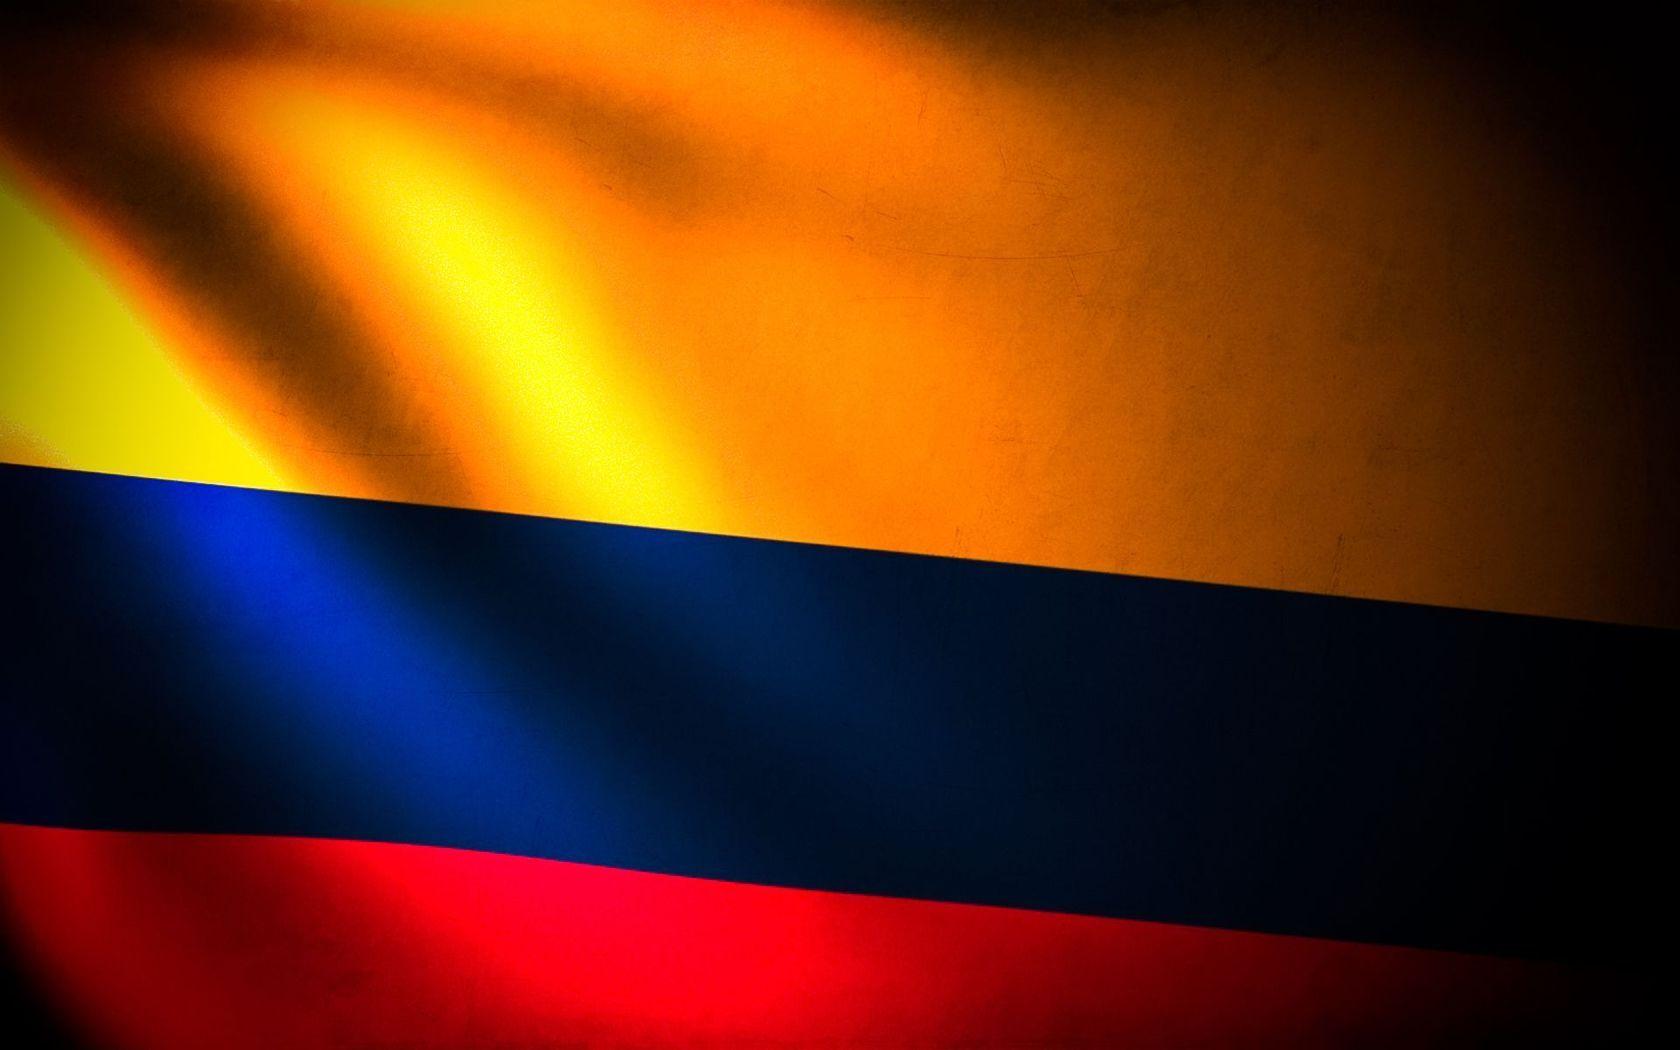 Colombian Flag Http Imashon Com Digital Art Colombian Flag Html With Images Colombian Flag Digital Art Hd Wallpaper